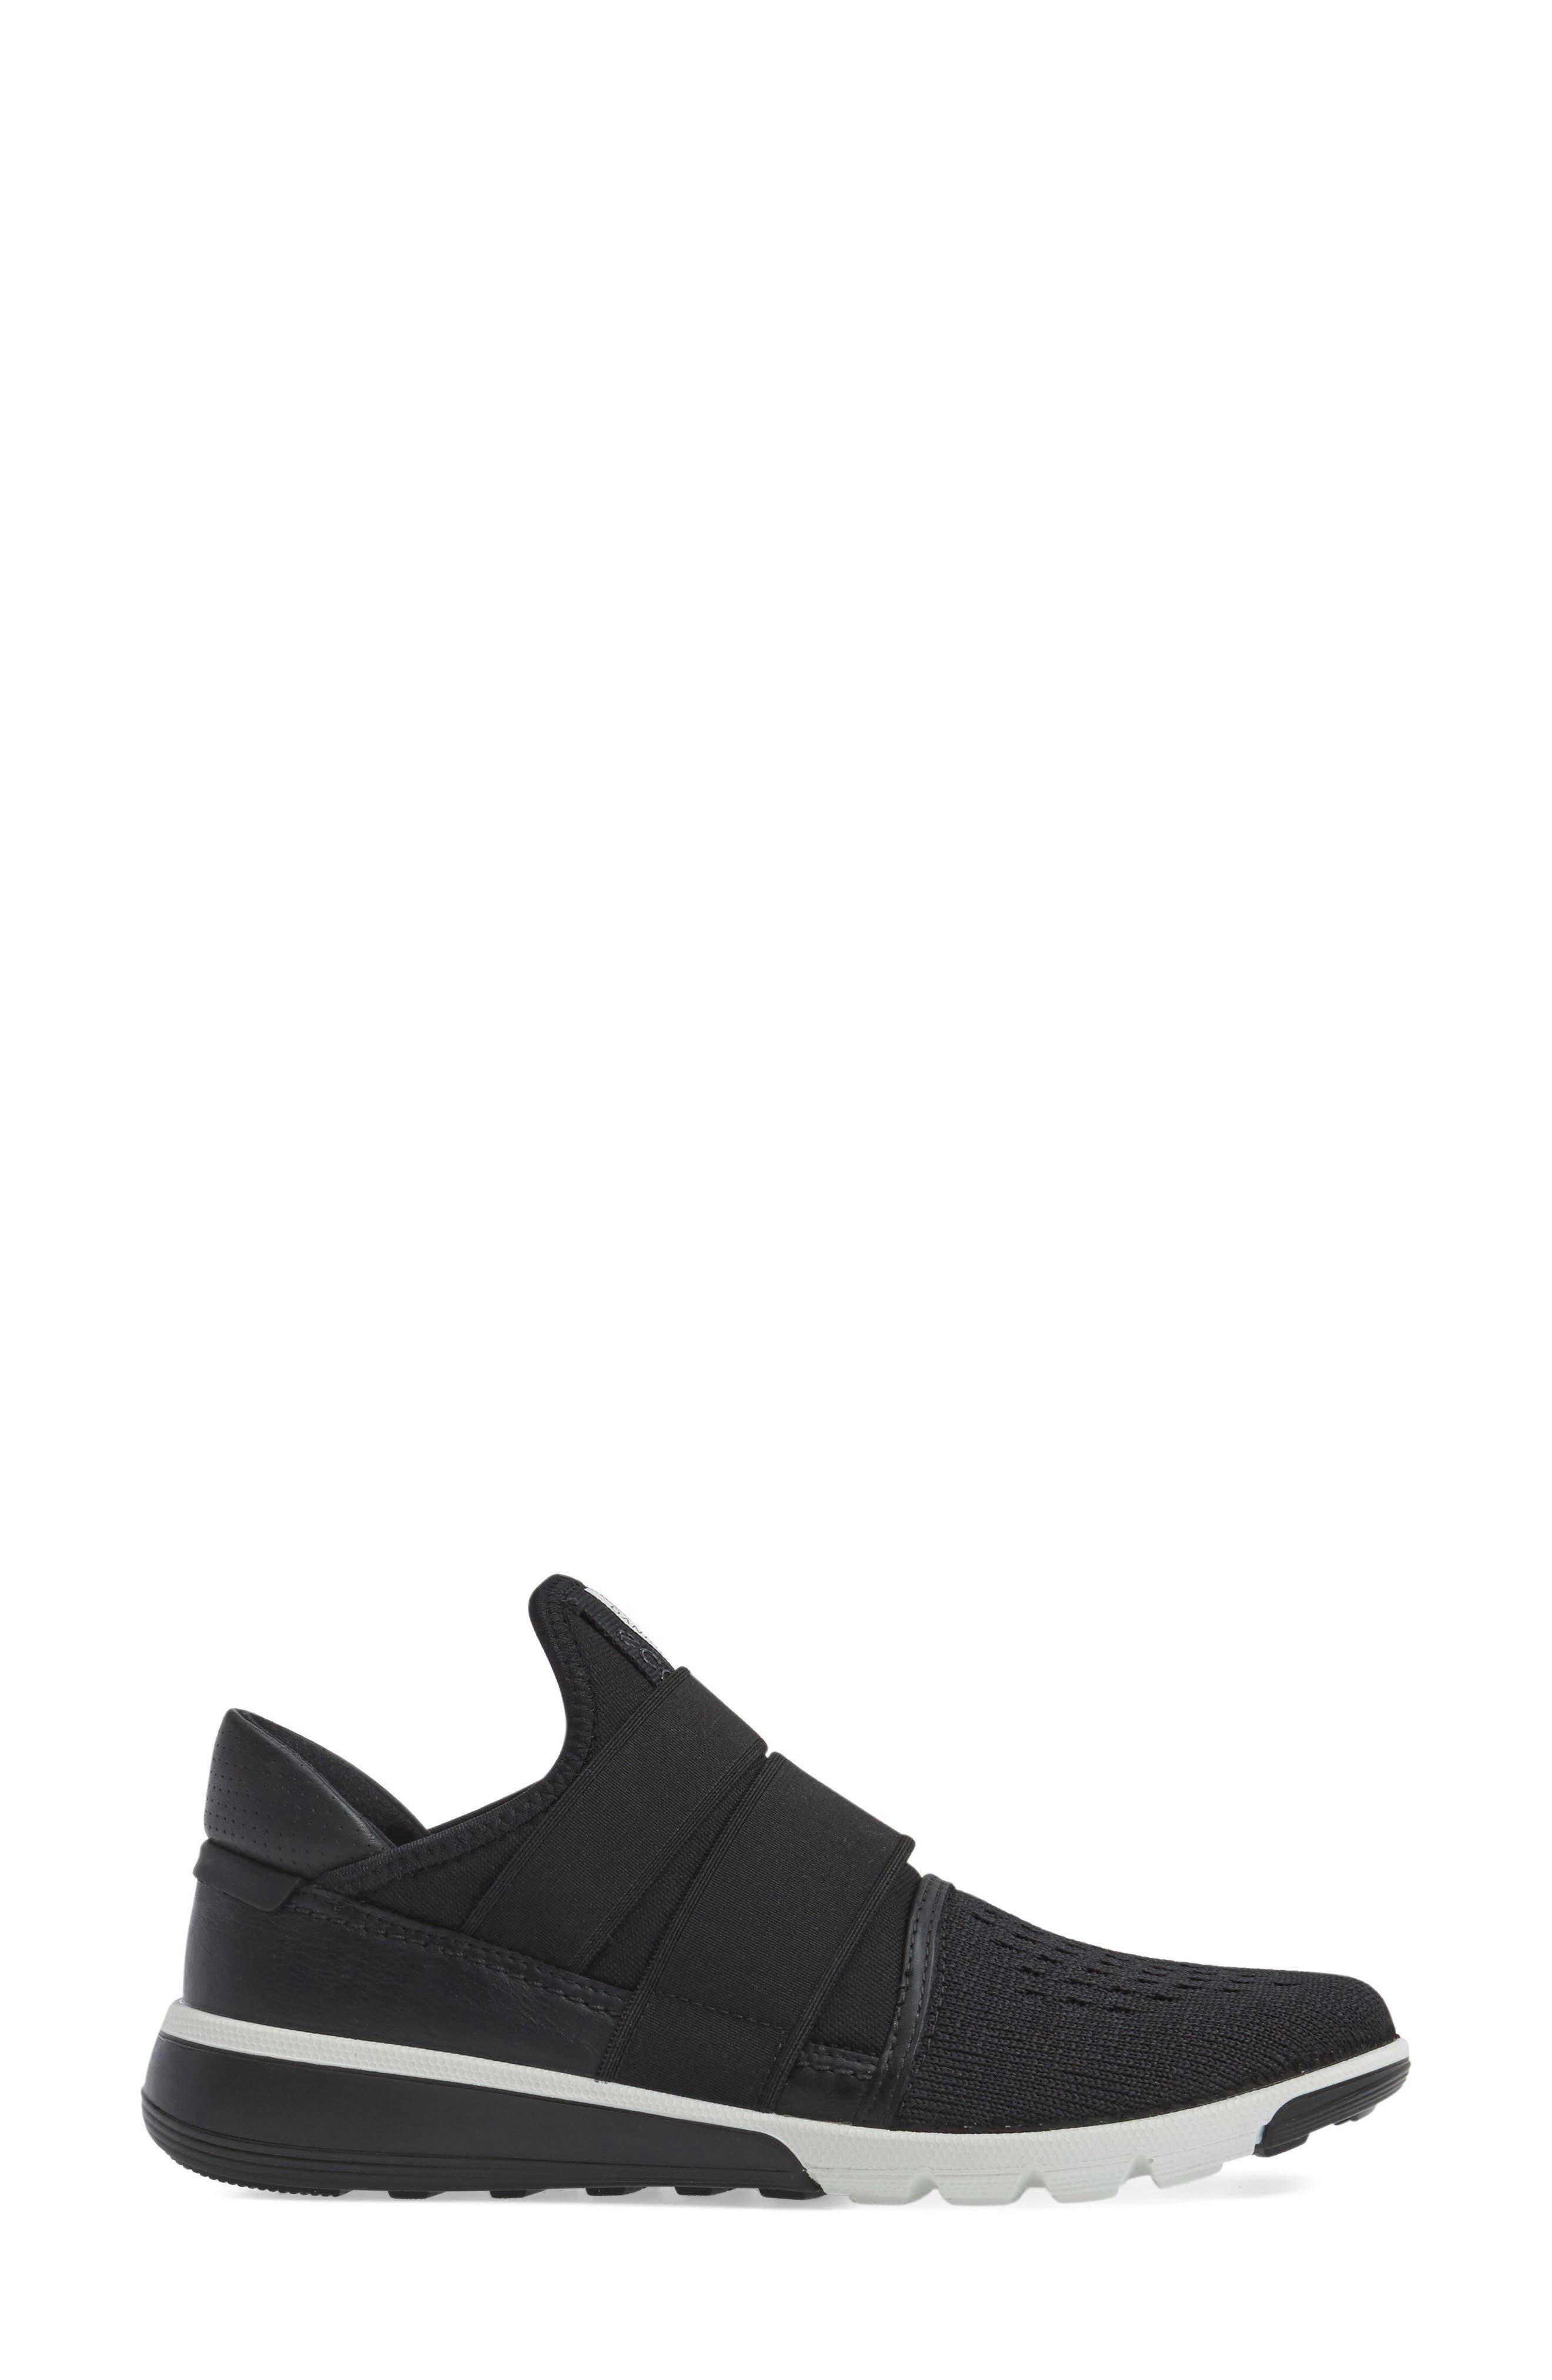 'Intrinsic 2' Sneaker,                             Alternate thumbnail 3, color,                             001